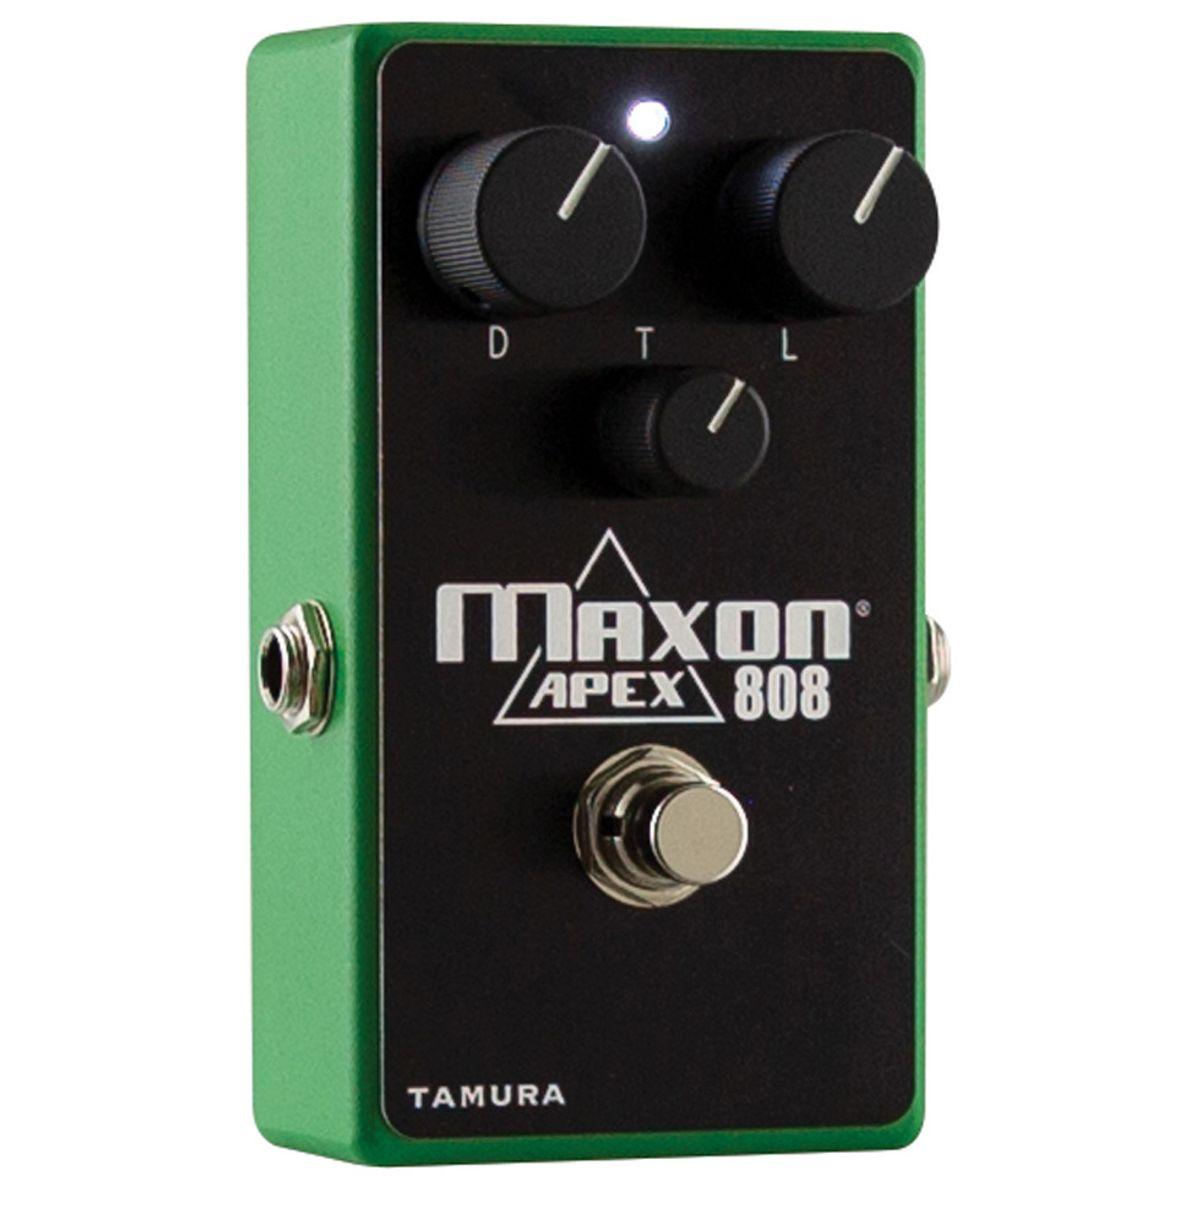 Maxon's Elegant Spin on the TS808